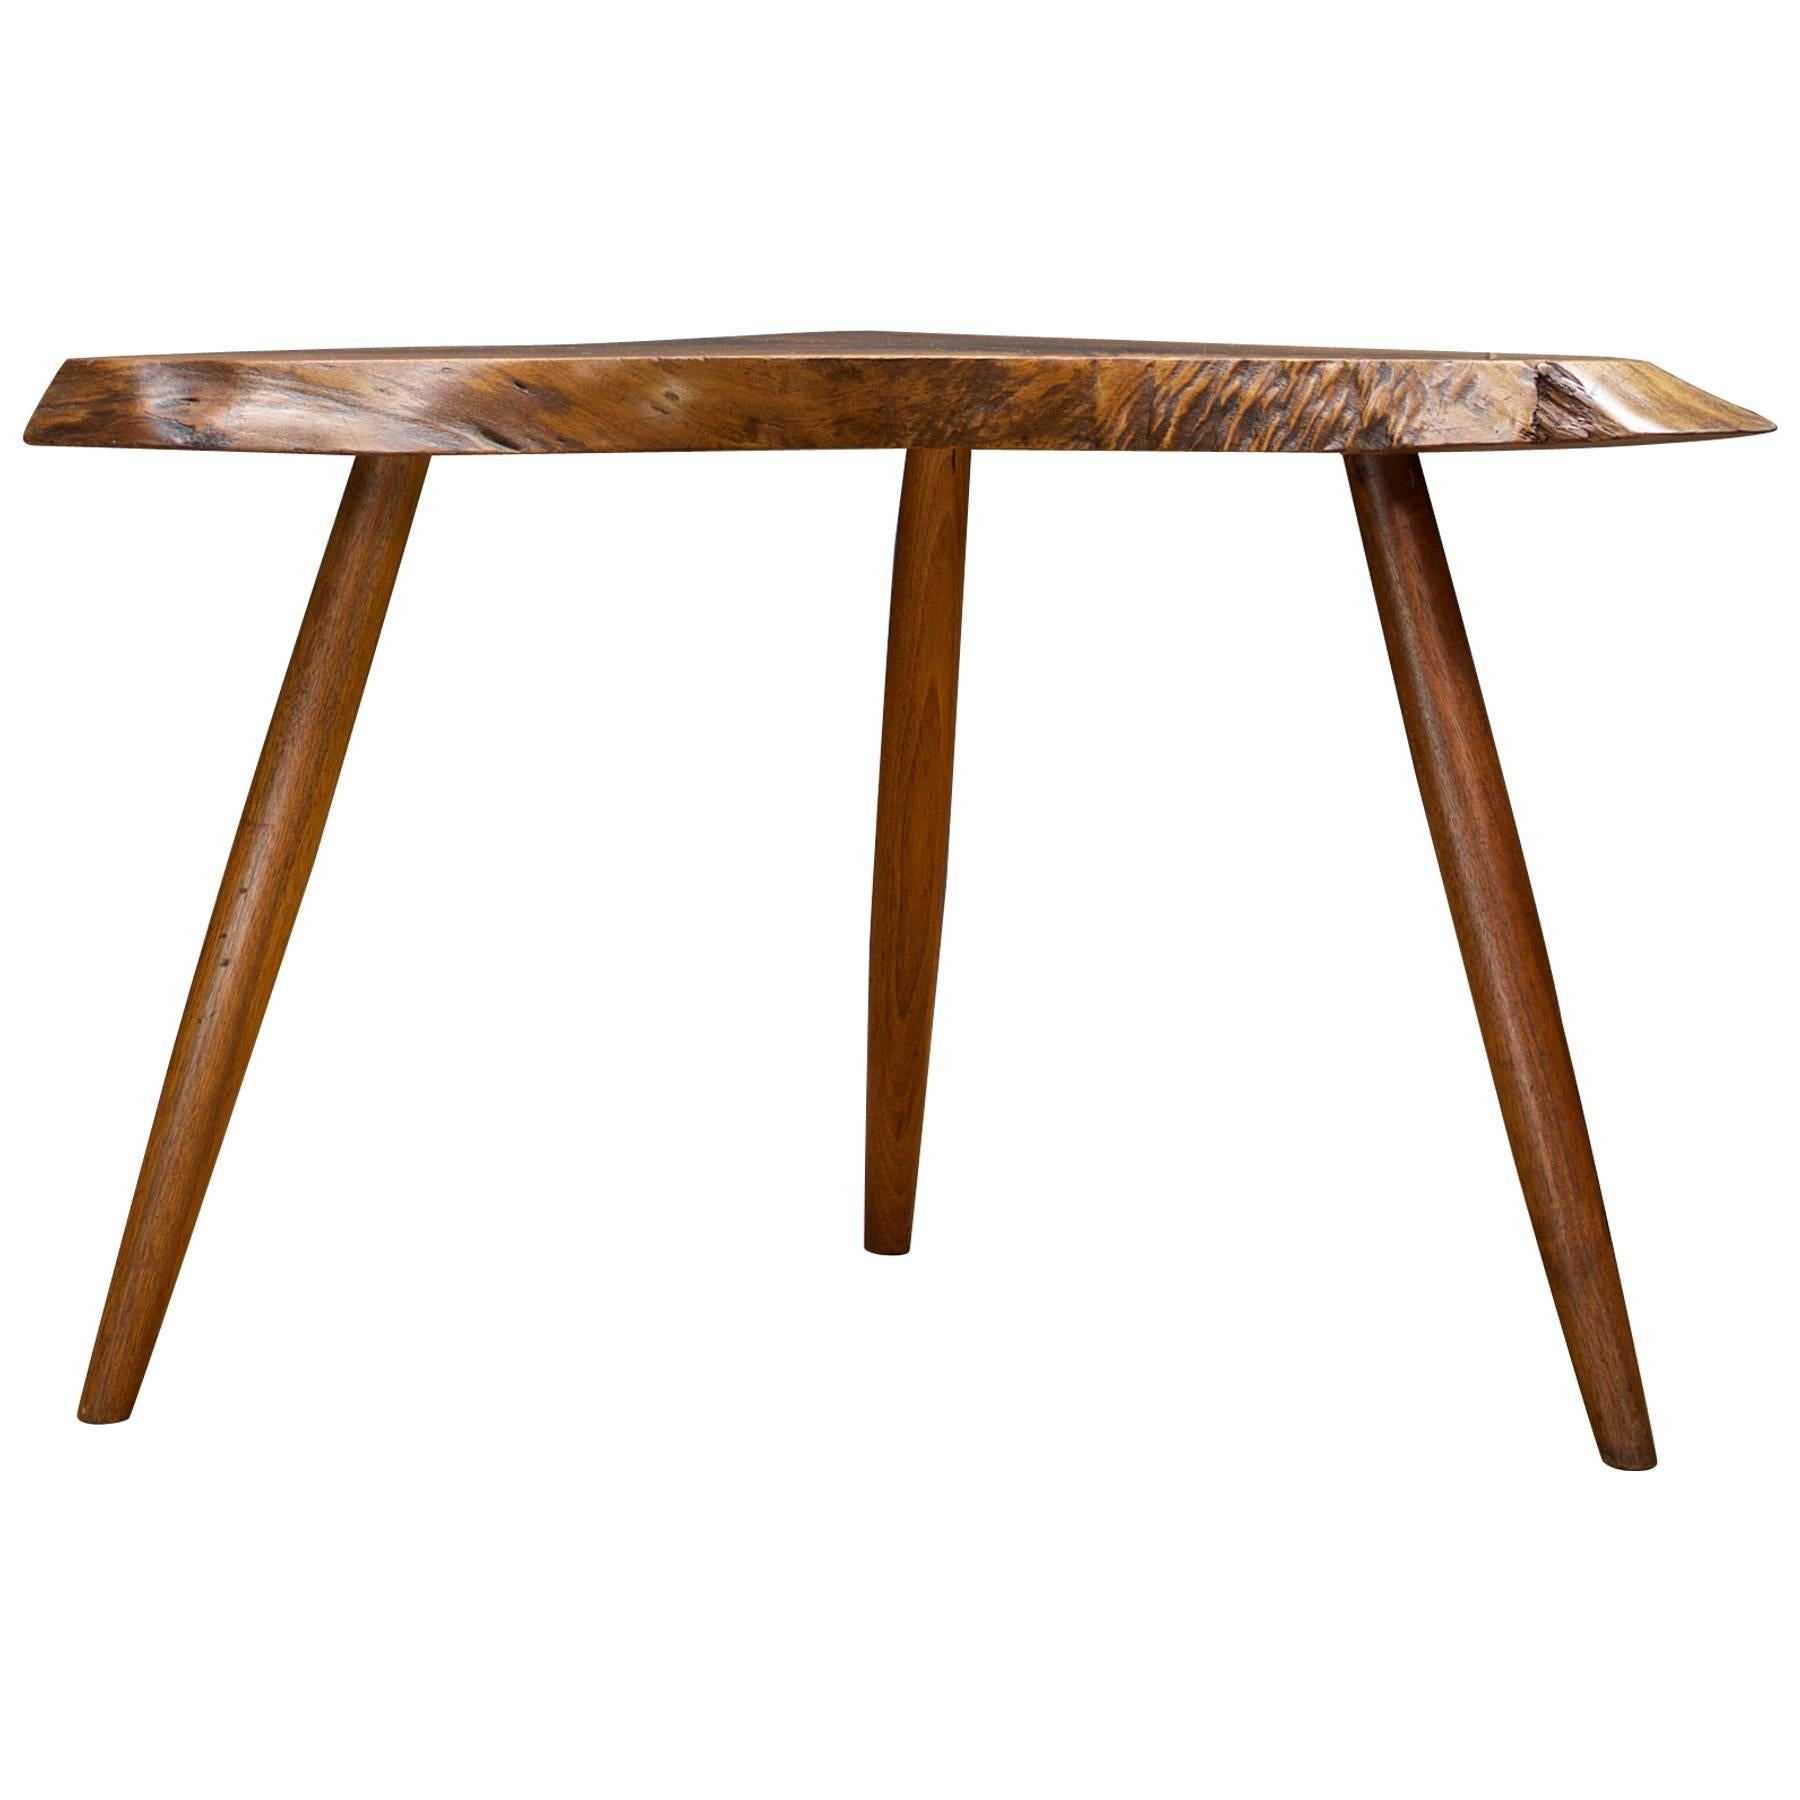 George Nakashima Wepman Table Live Edge Rustic CabinModern Walnut Stool